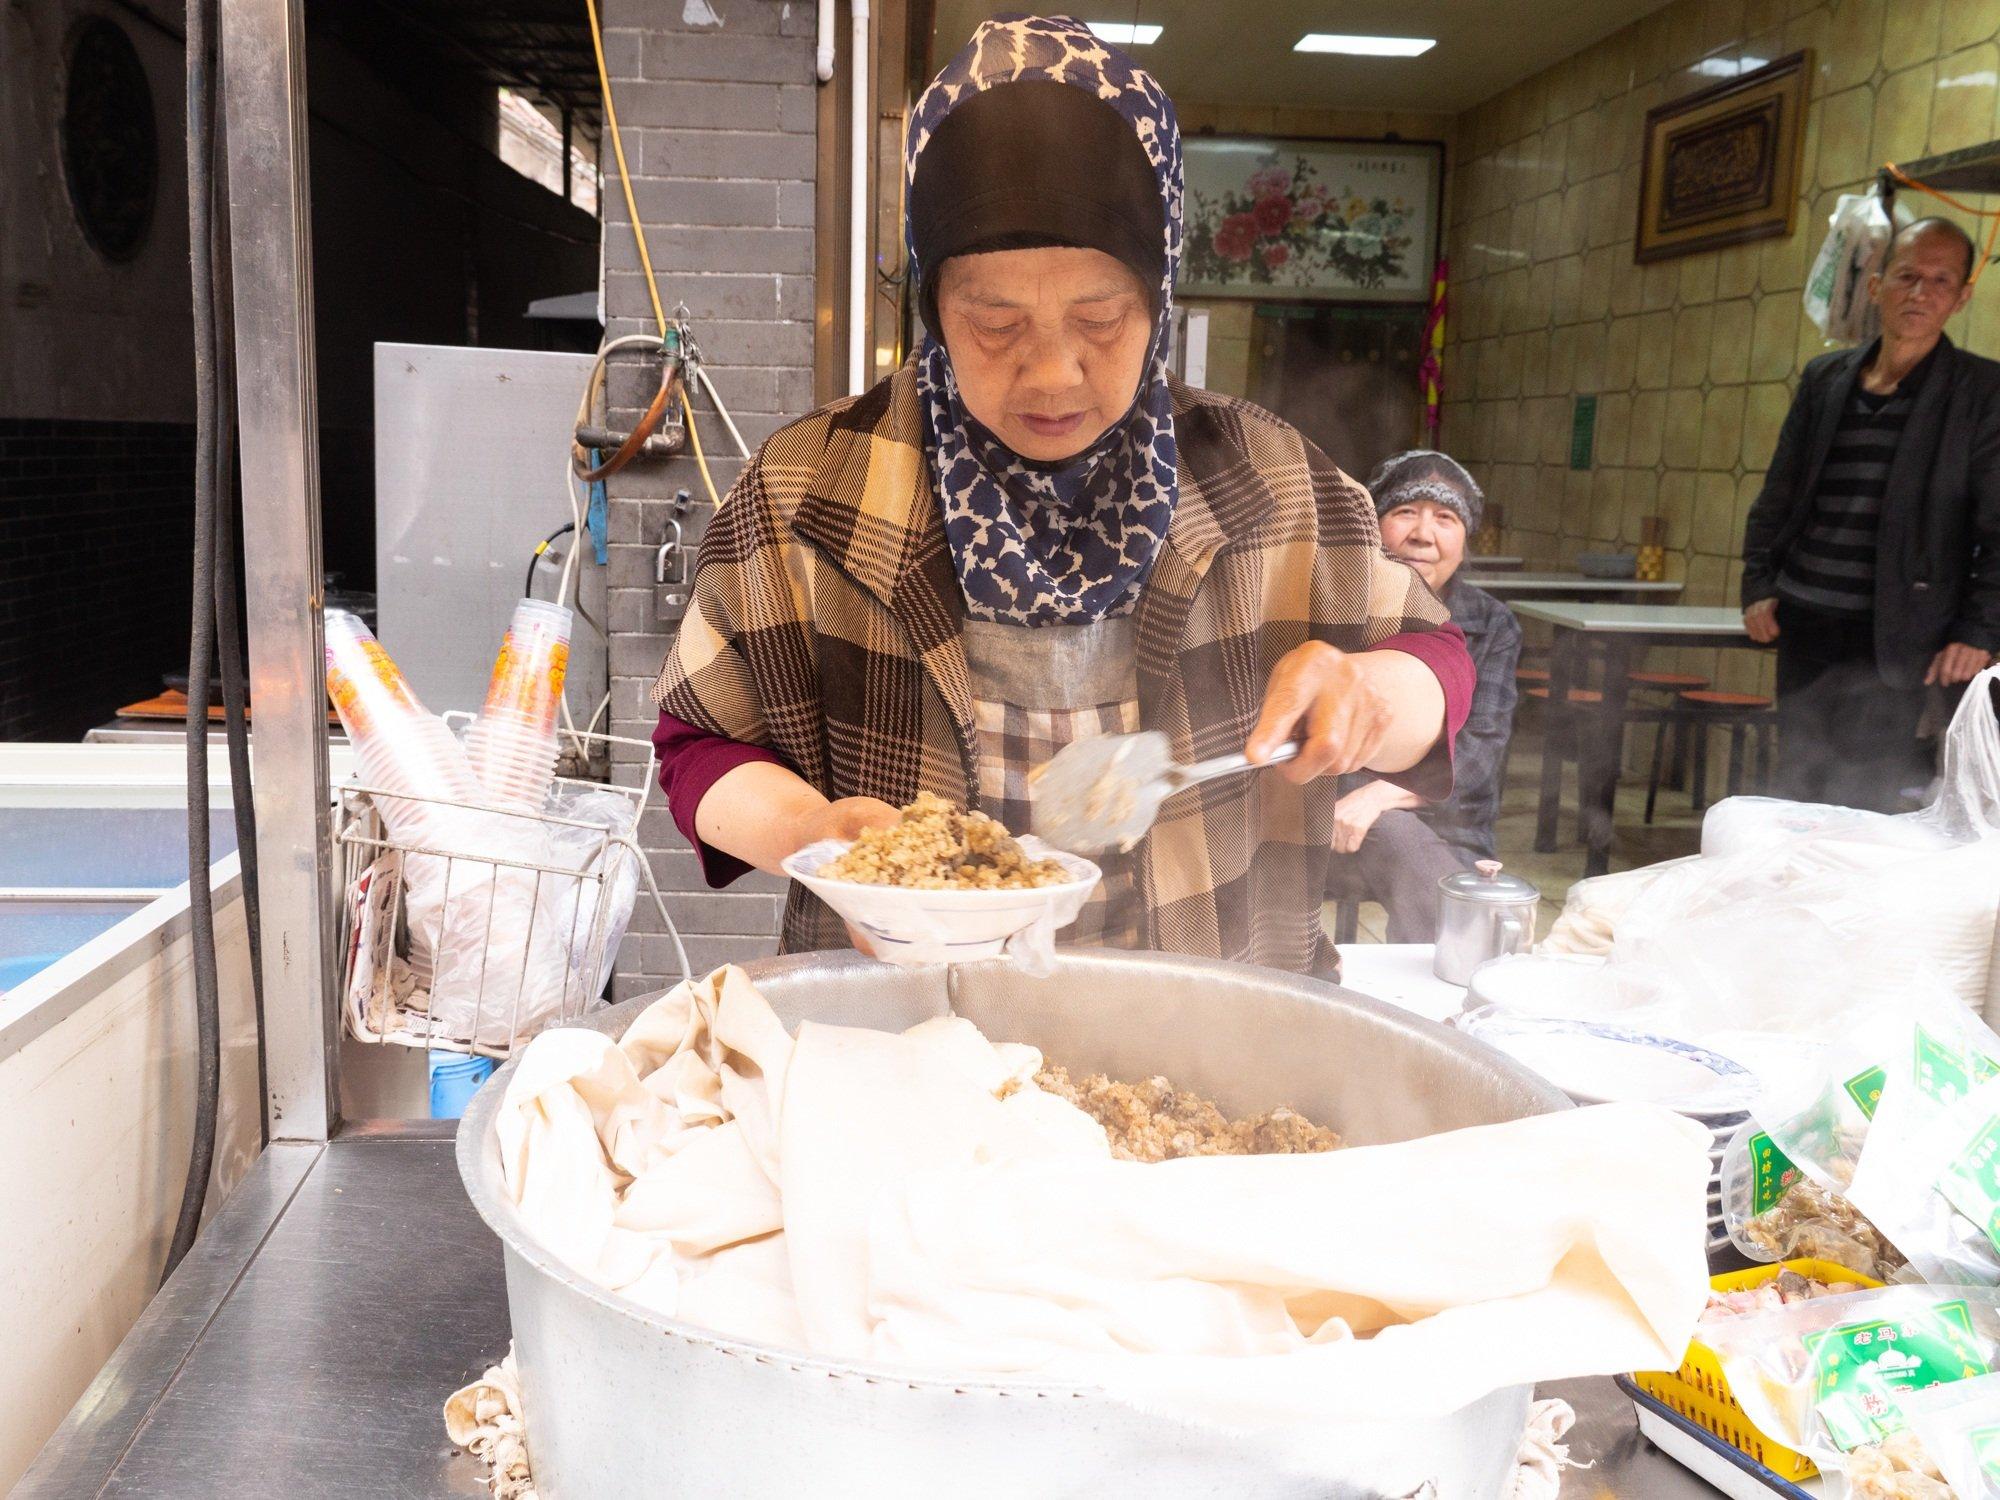 Great street food fenzhengrou in Xi'an